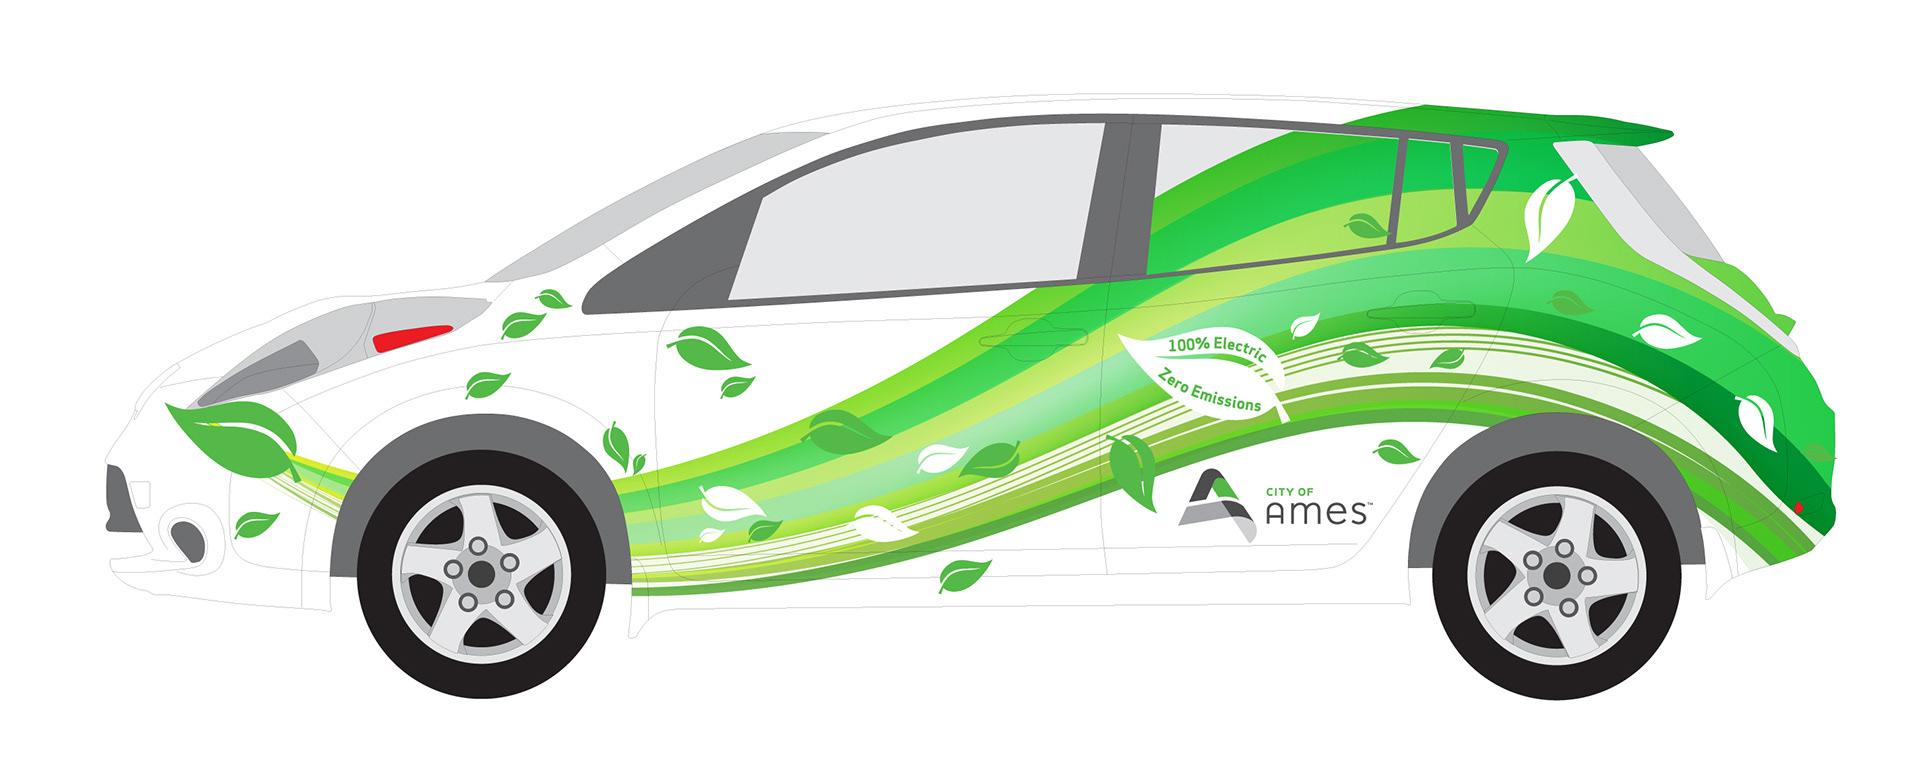 Nissan Iowa City >> Derek Zarn - Nissan Leaf Electric Car Wrap